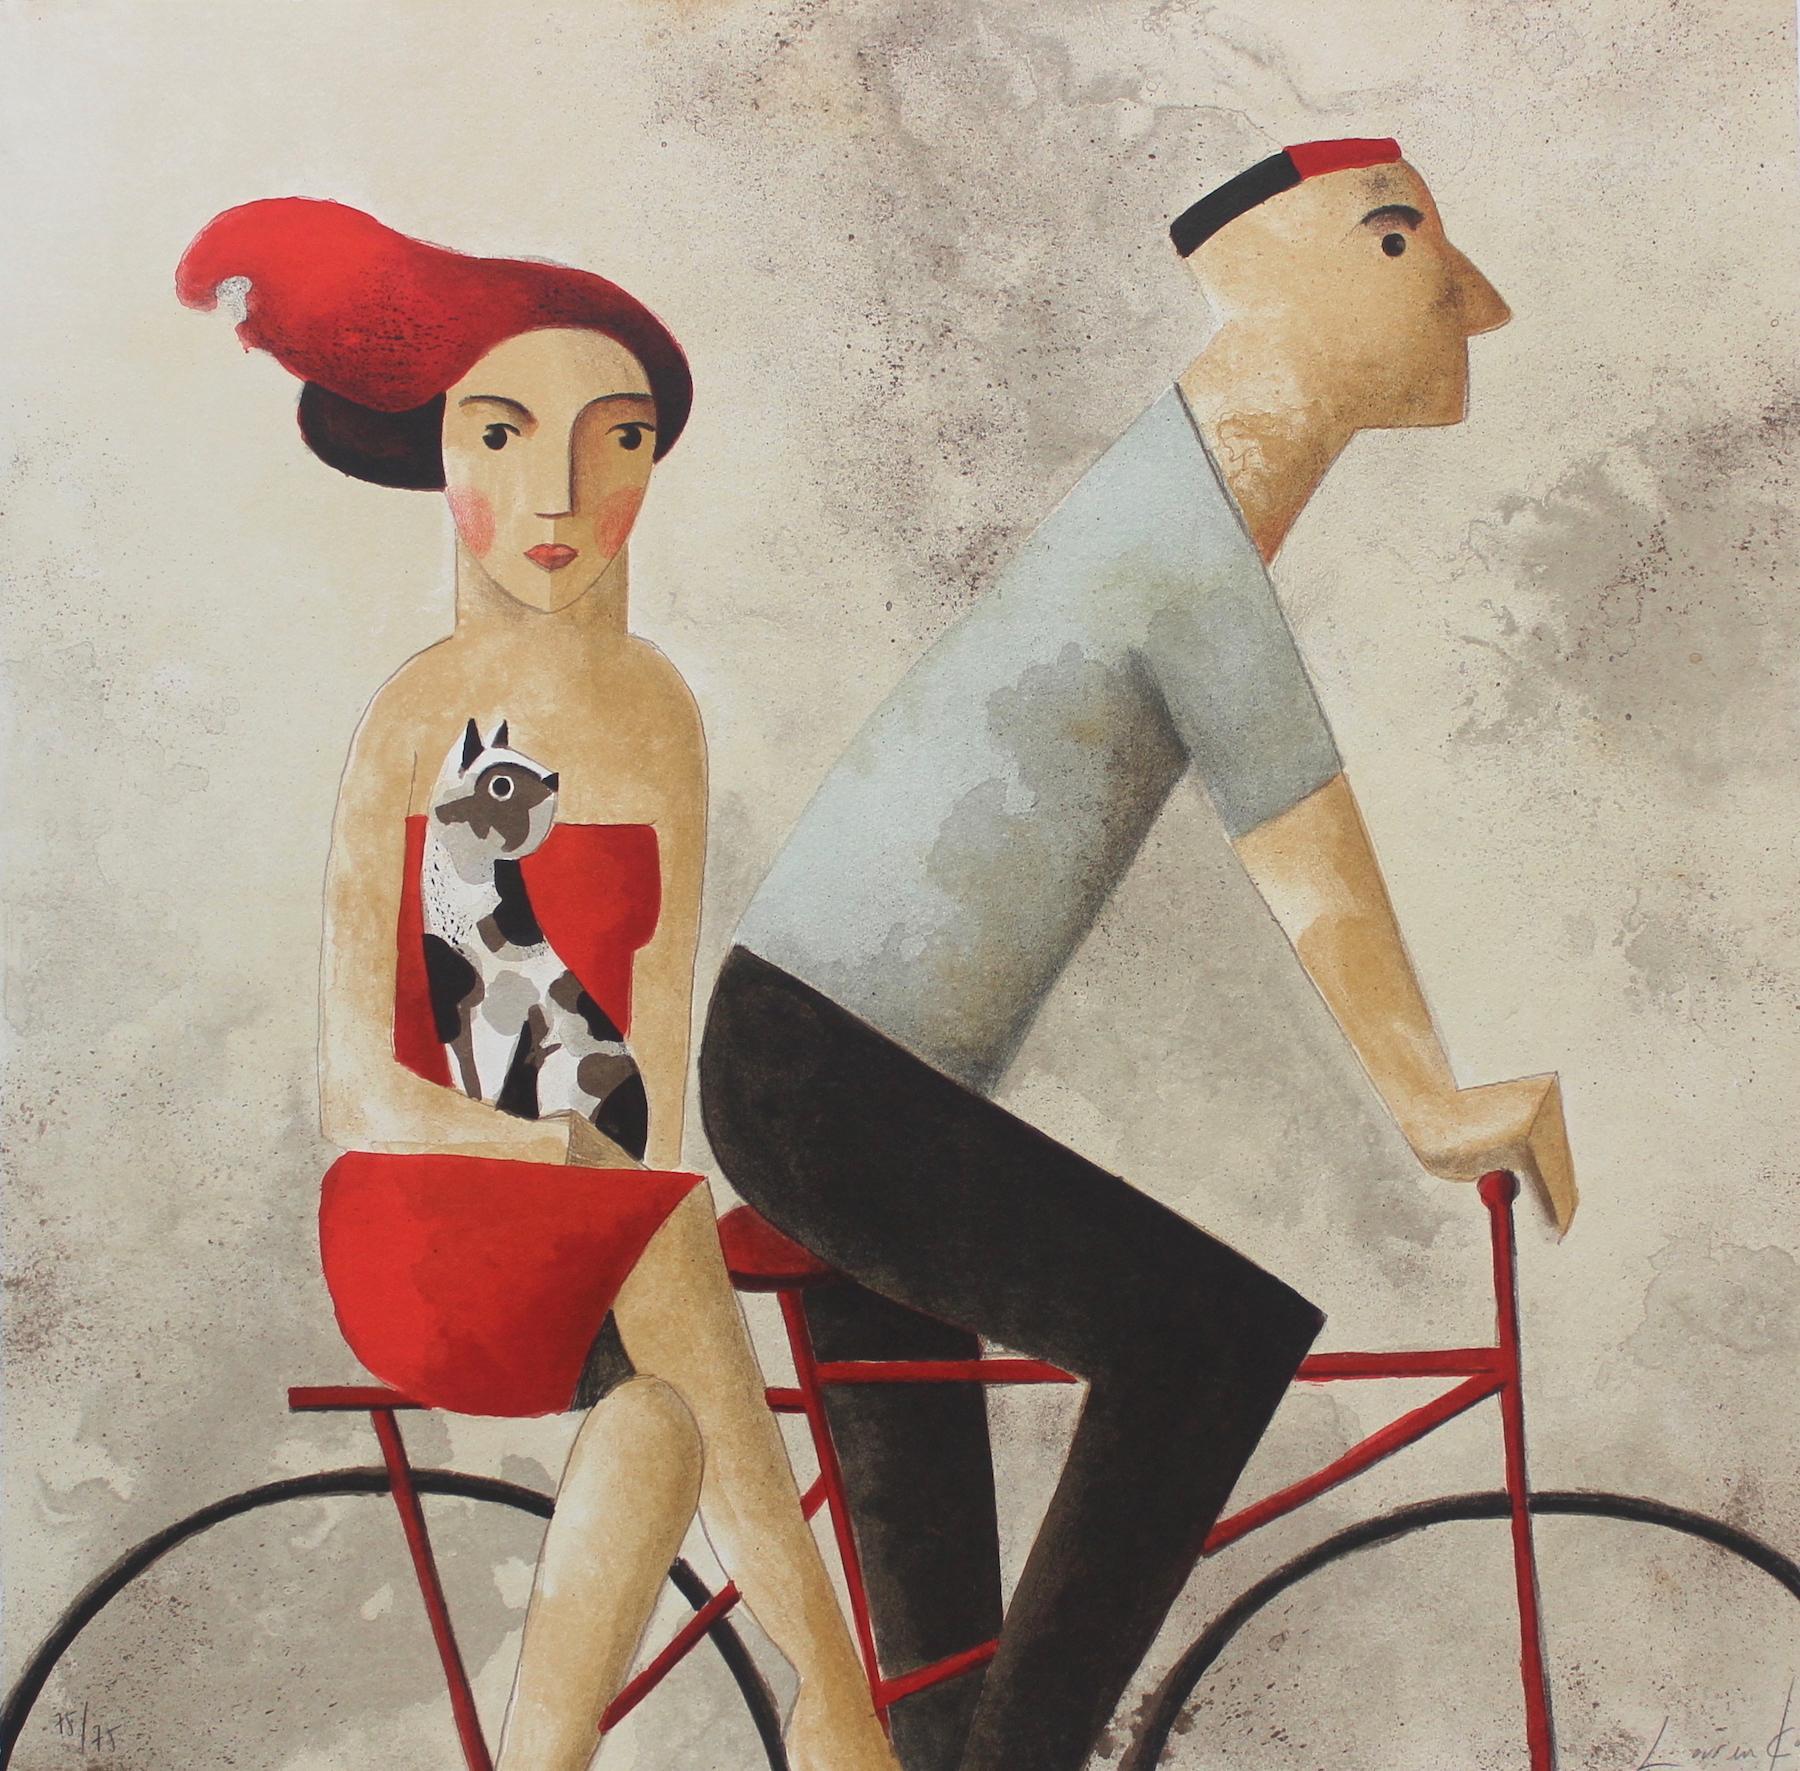 With You - Original Lithograph by Spanish Artist Didier Lourenço